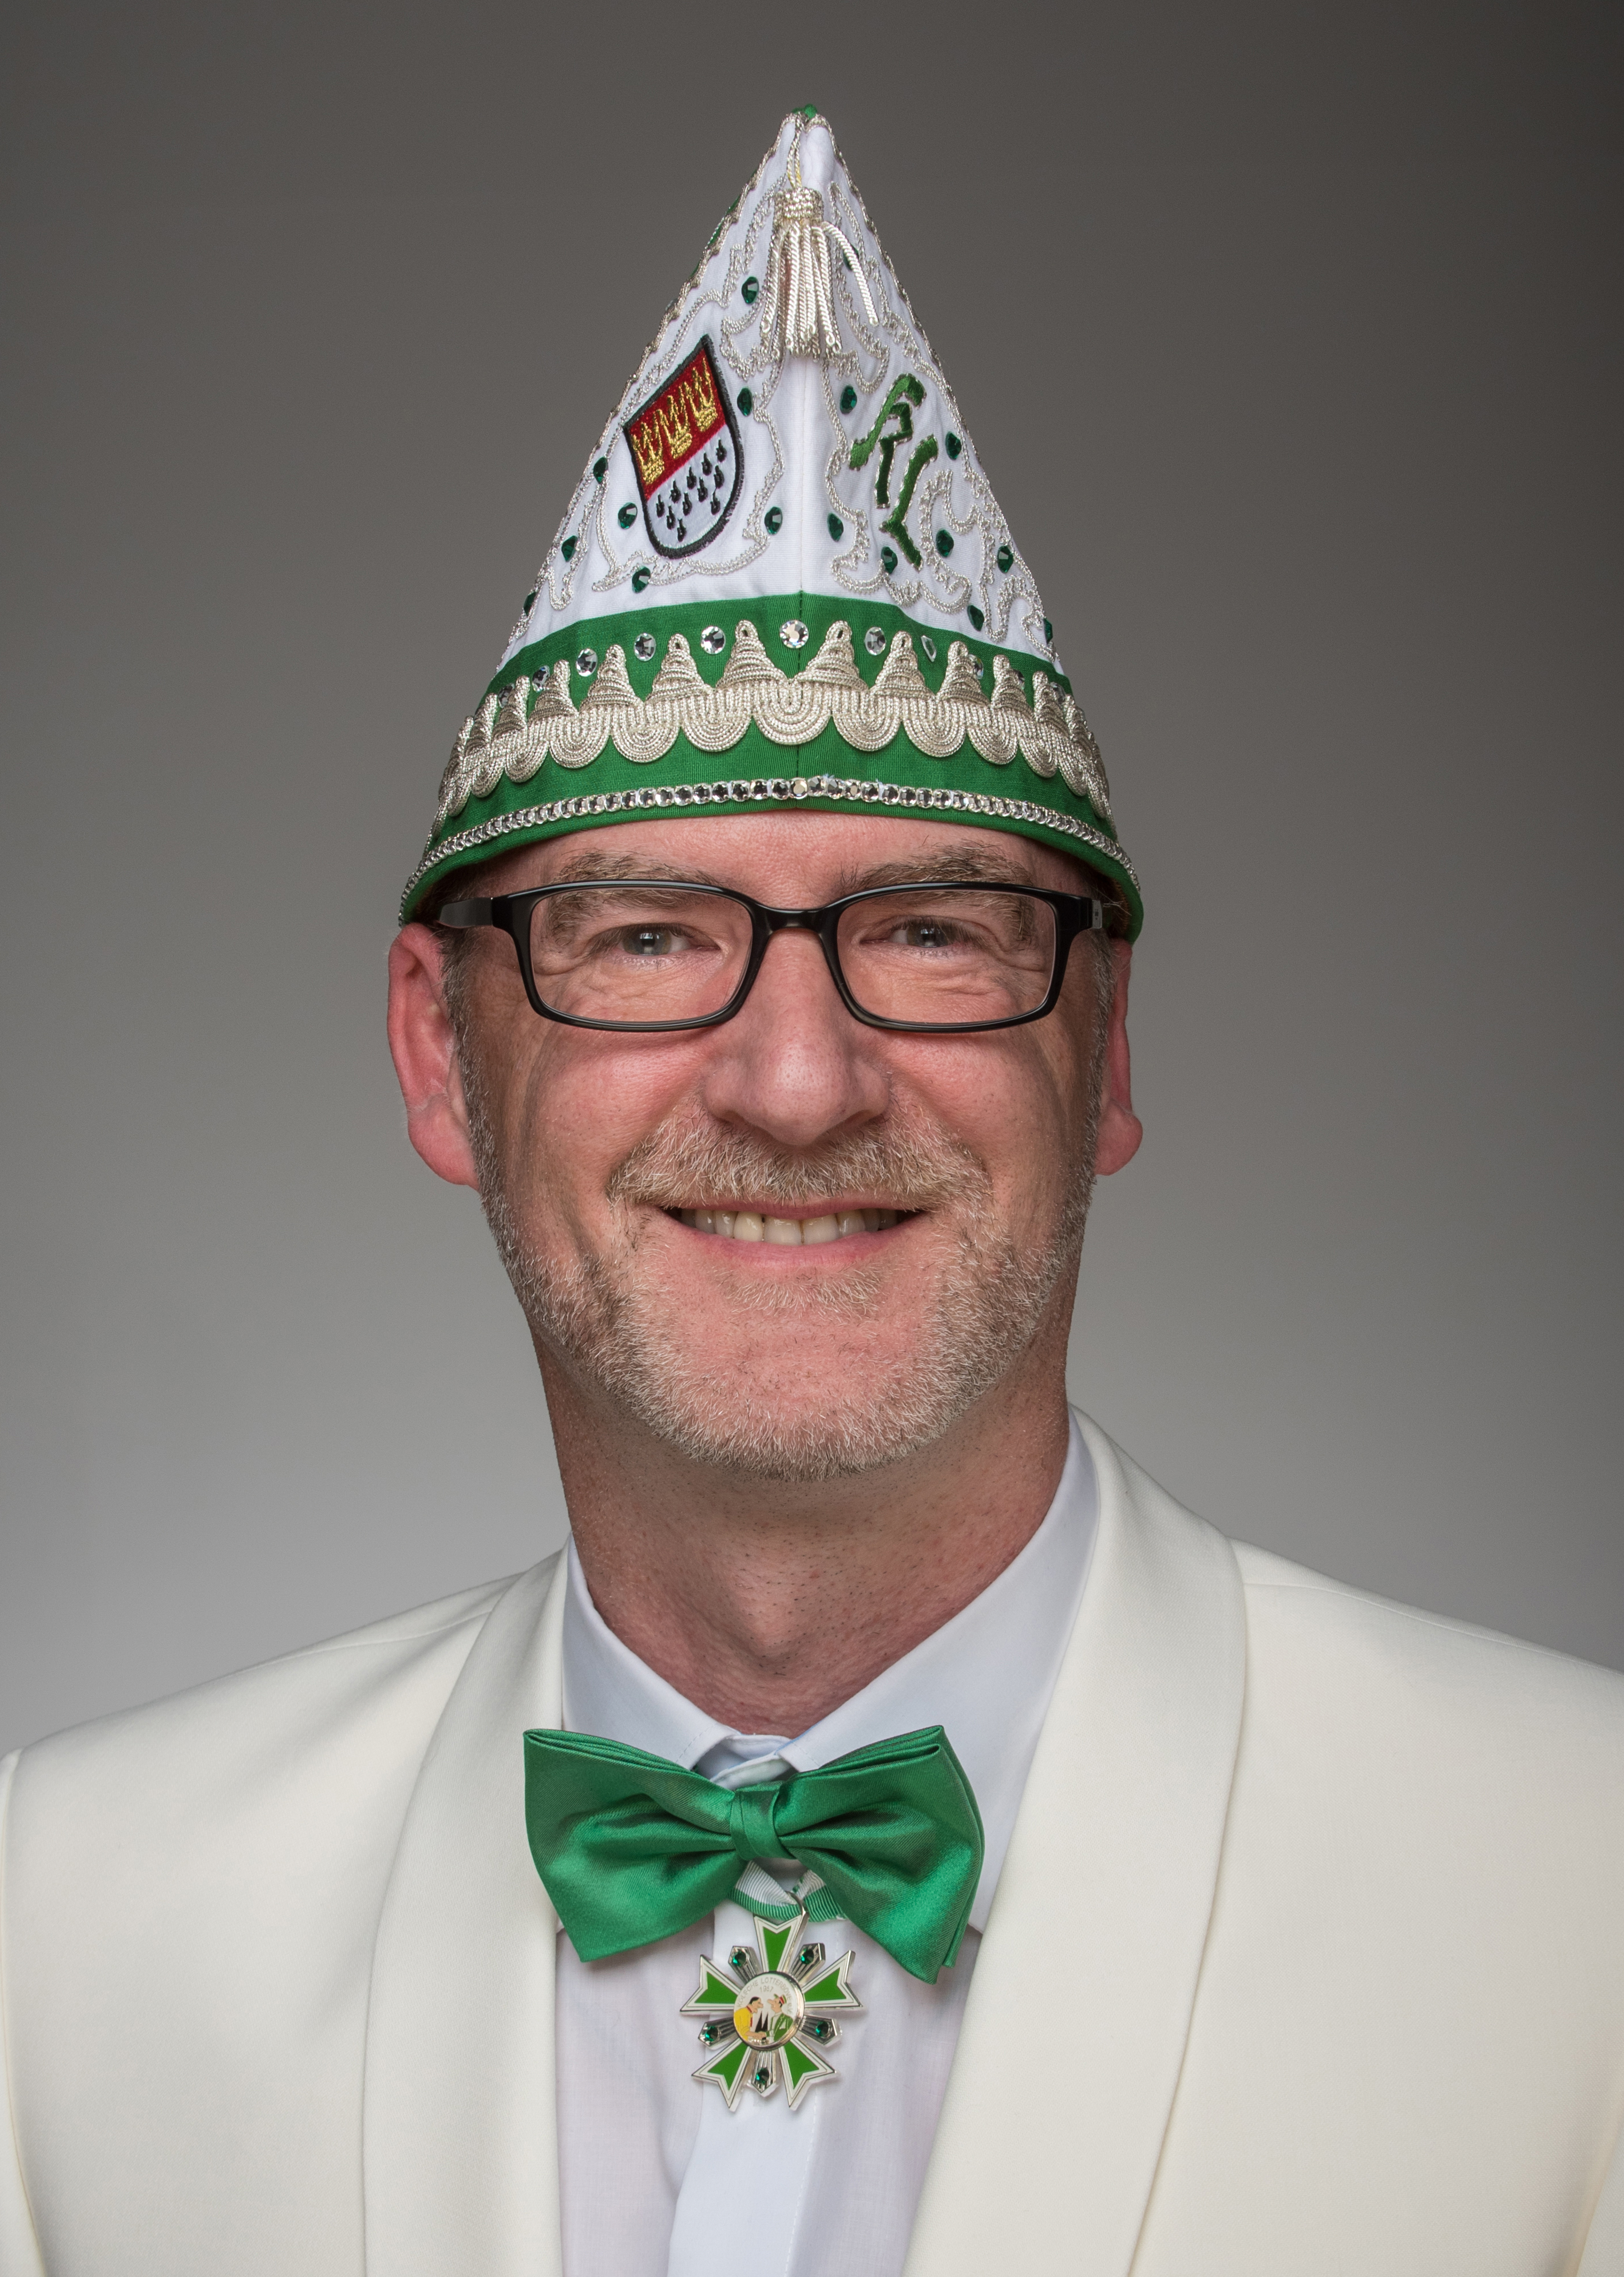 Hans-Dieter Riehl